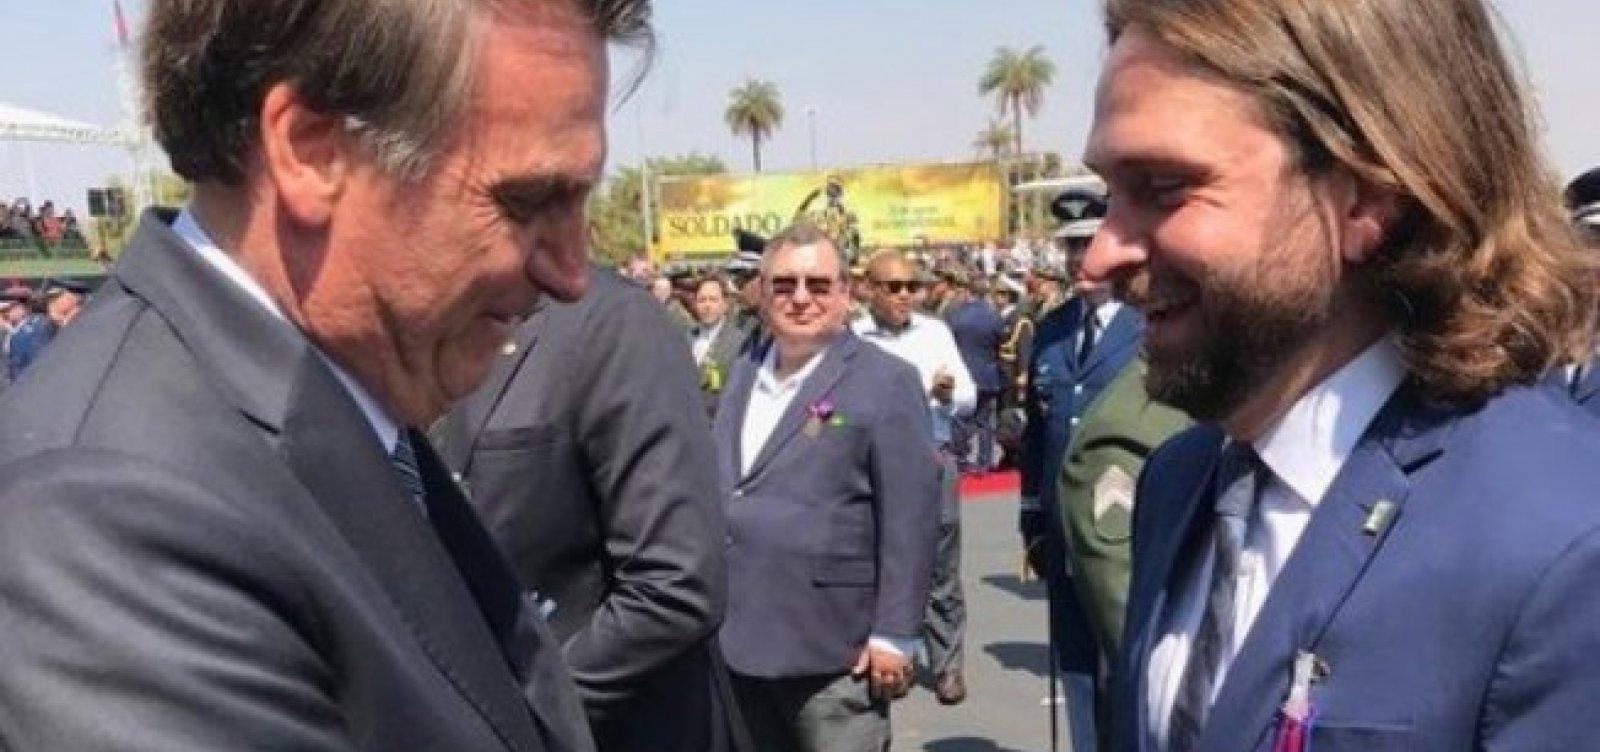 [Bolsonaro demite auxiliar de Onyx que fez 'voo particular' em jato da FAB]